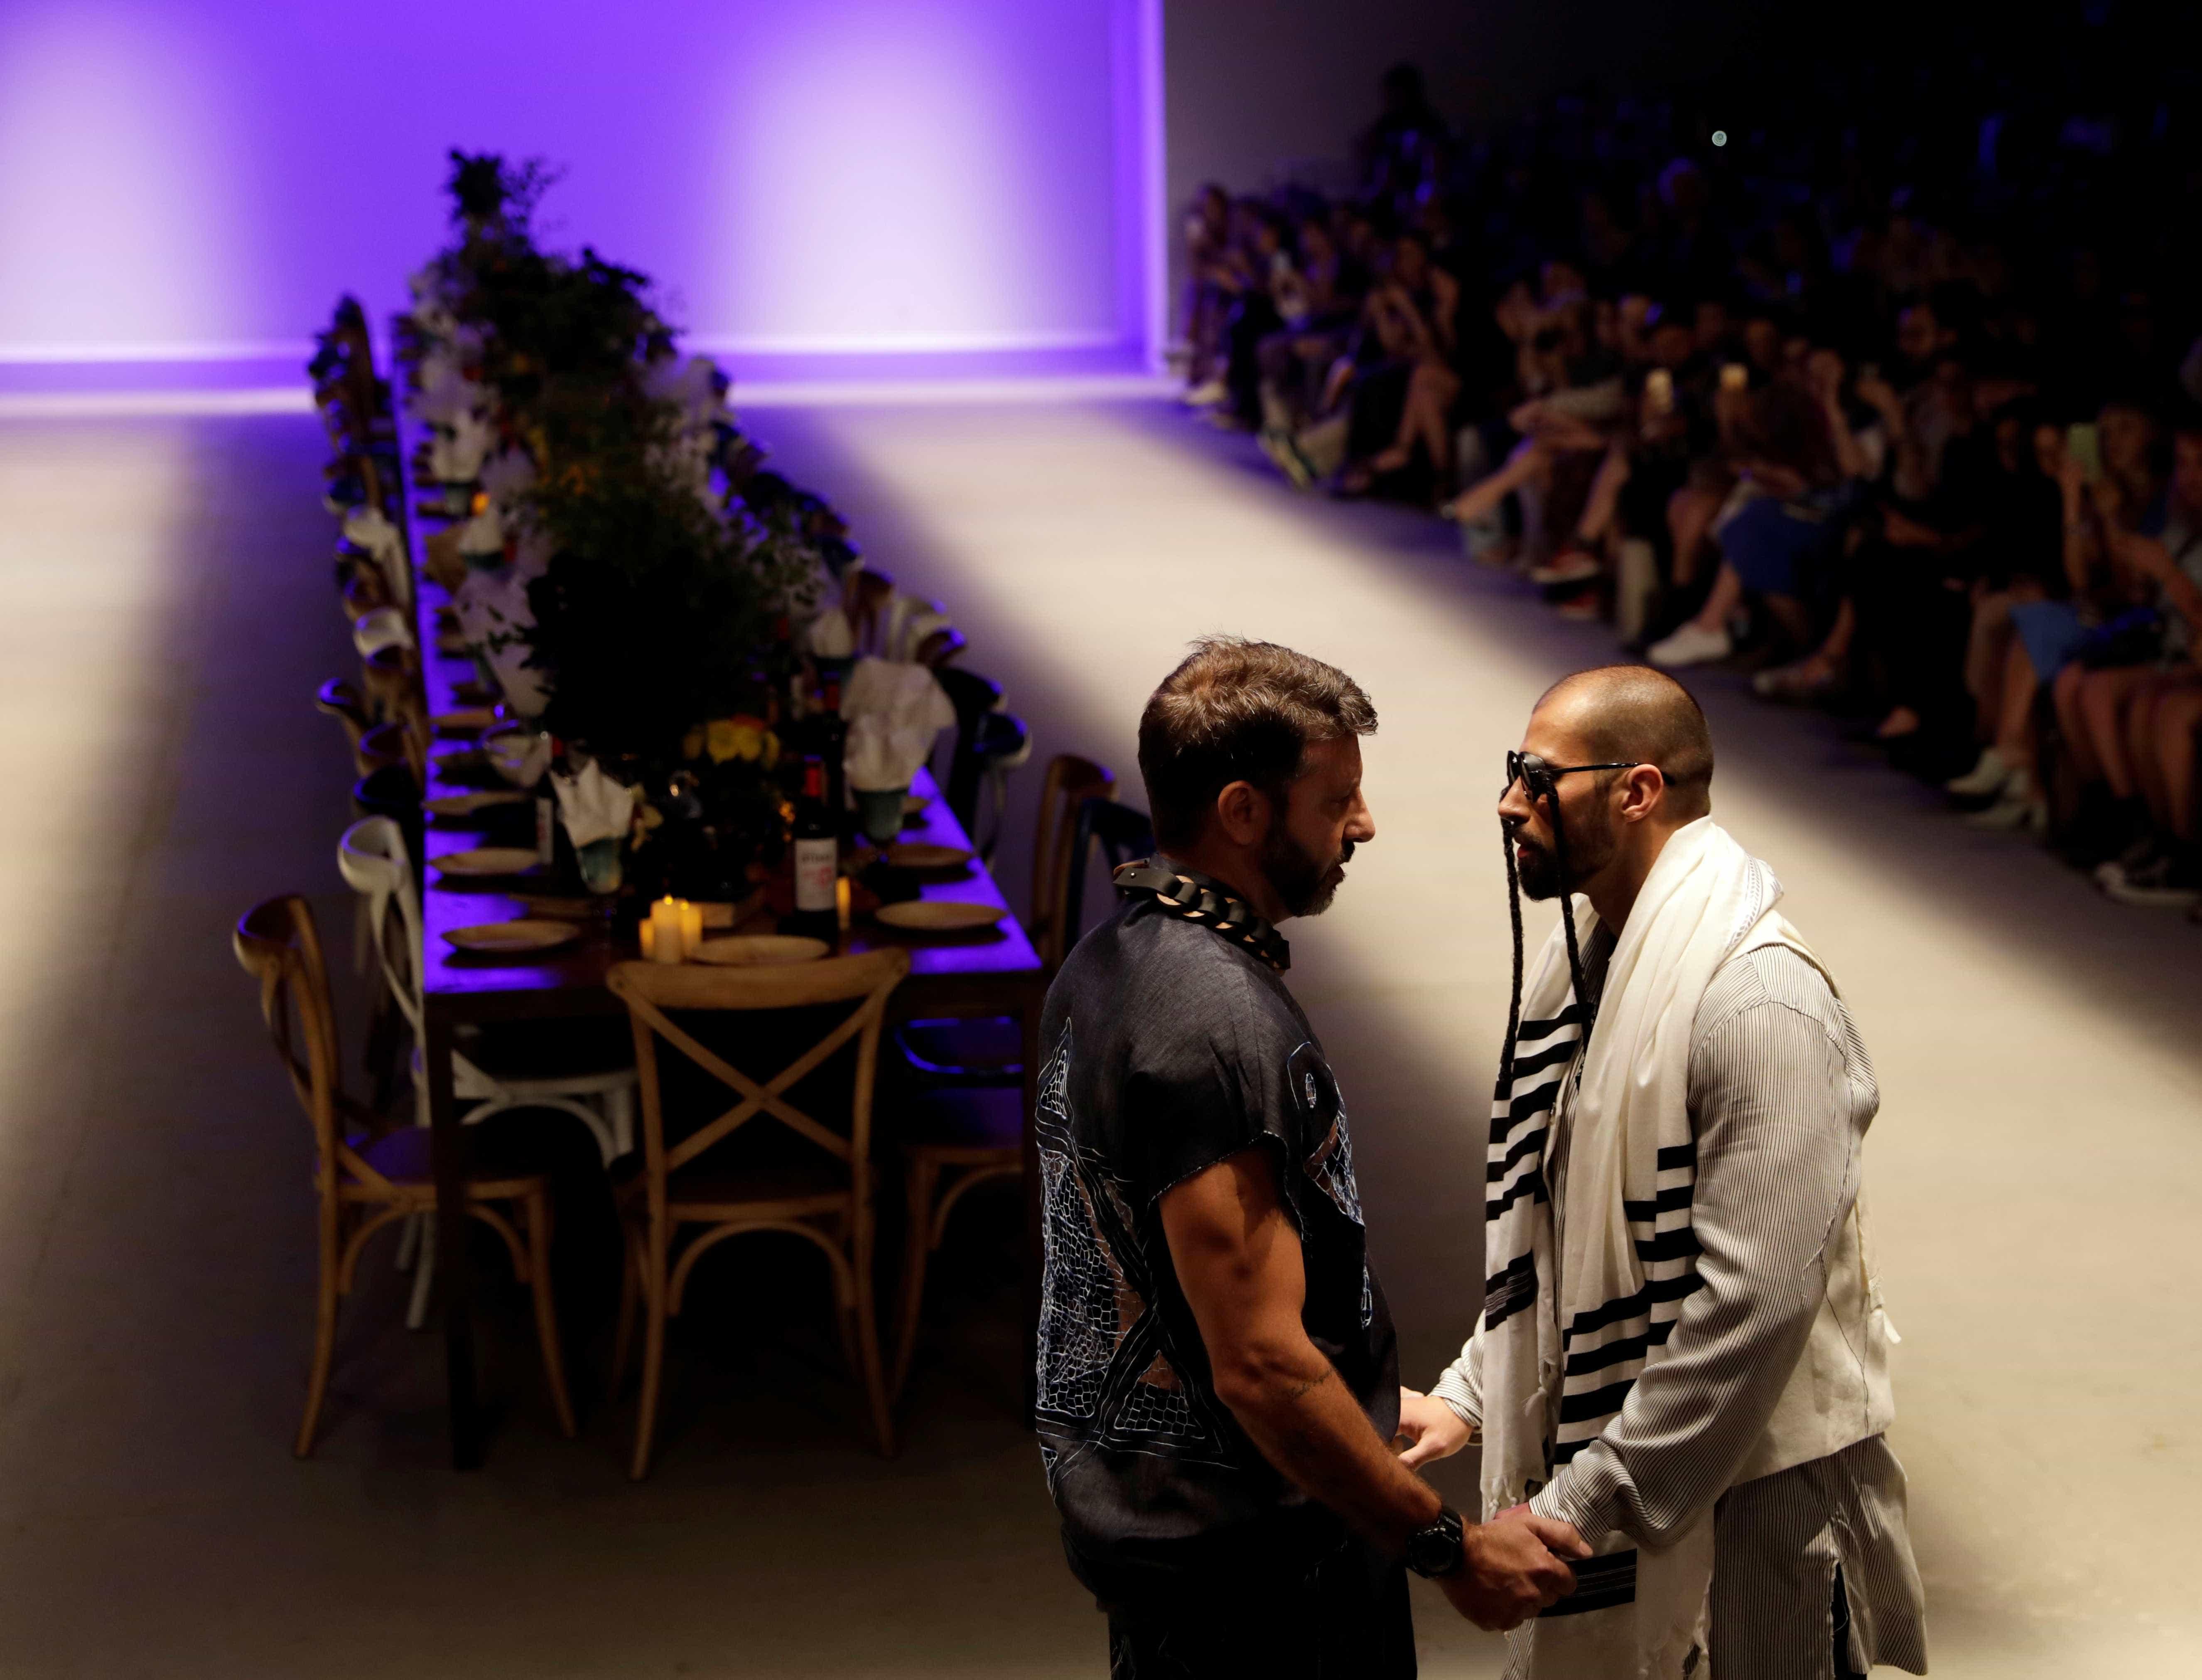 'Paira nuvem de intolerância sobre o país',diz hétero que deu beijo gay